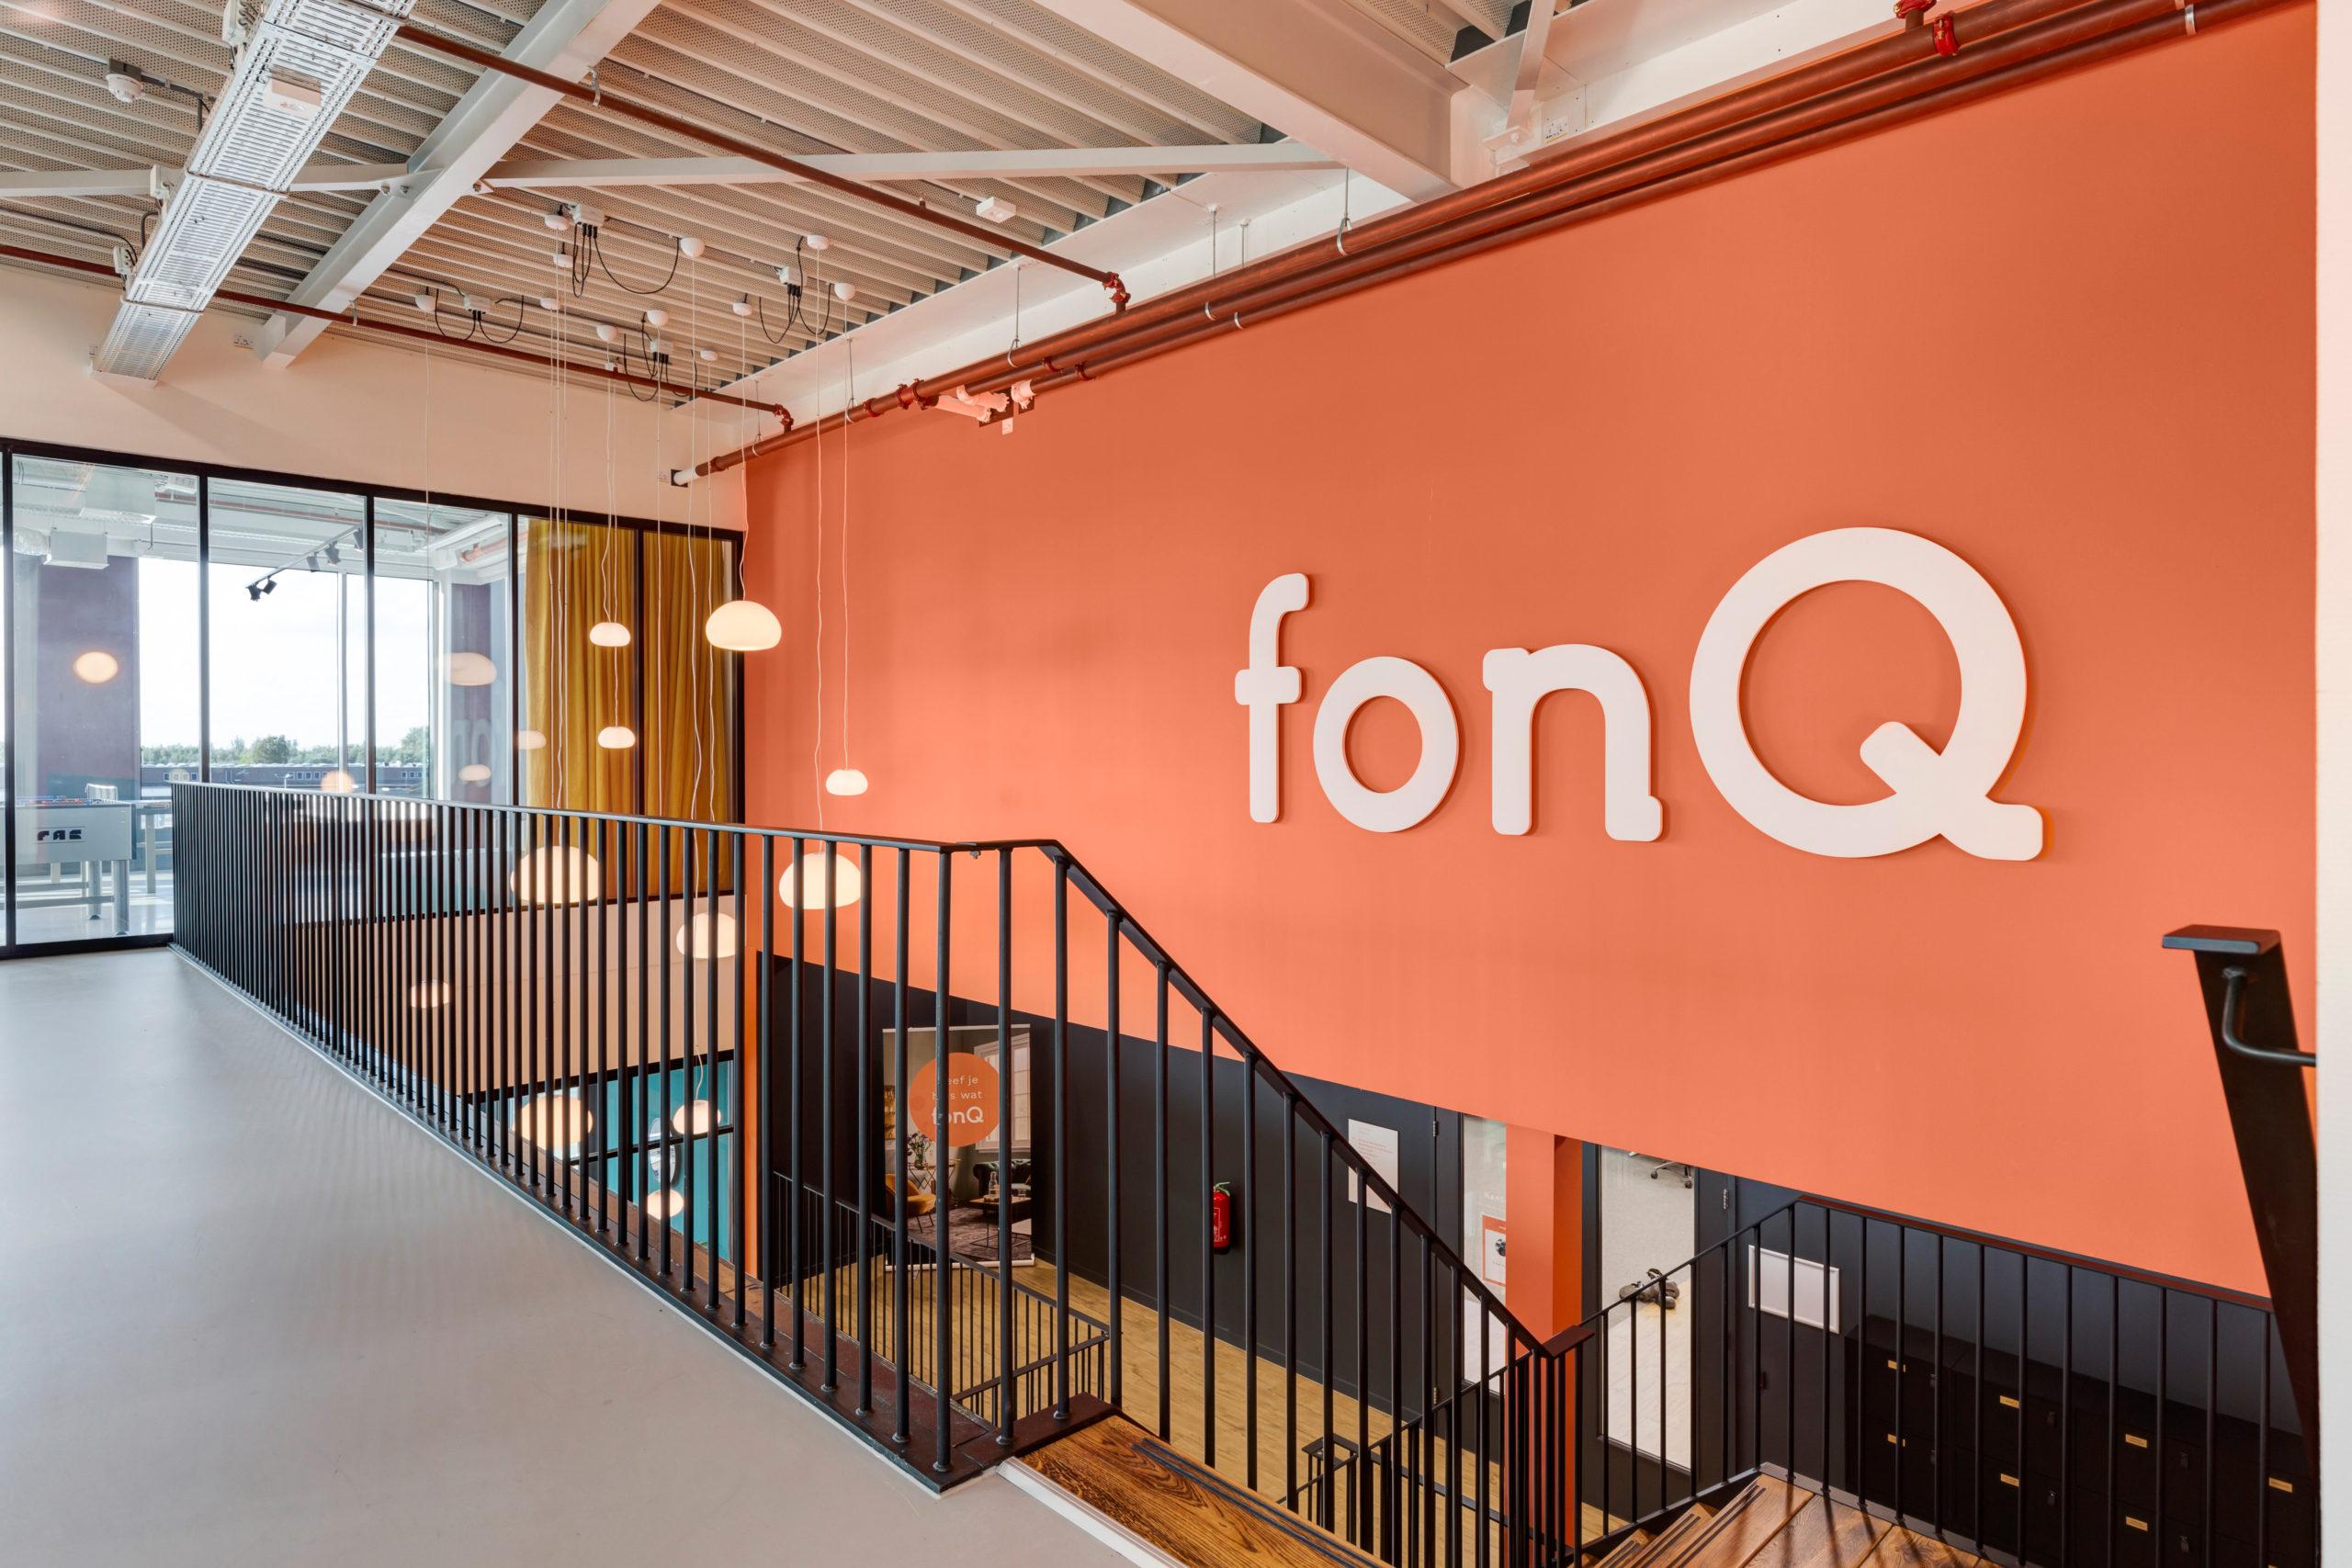 Fonq Grote Winnaar Shopping Awards 2021 Emerce